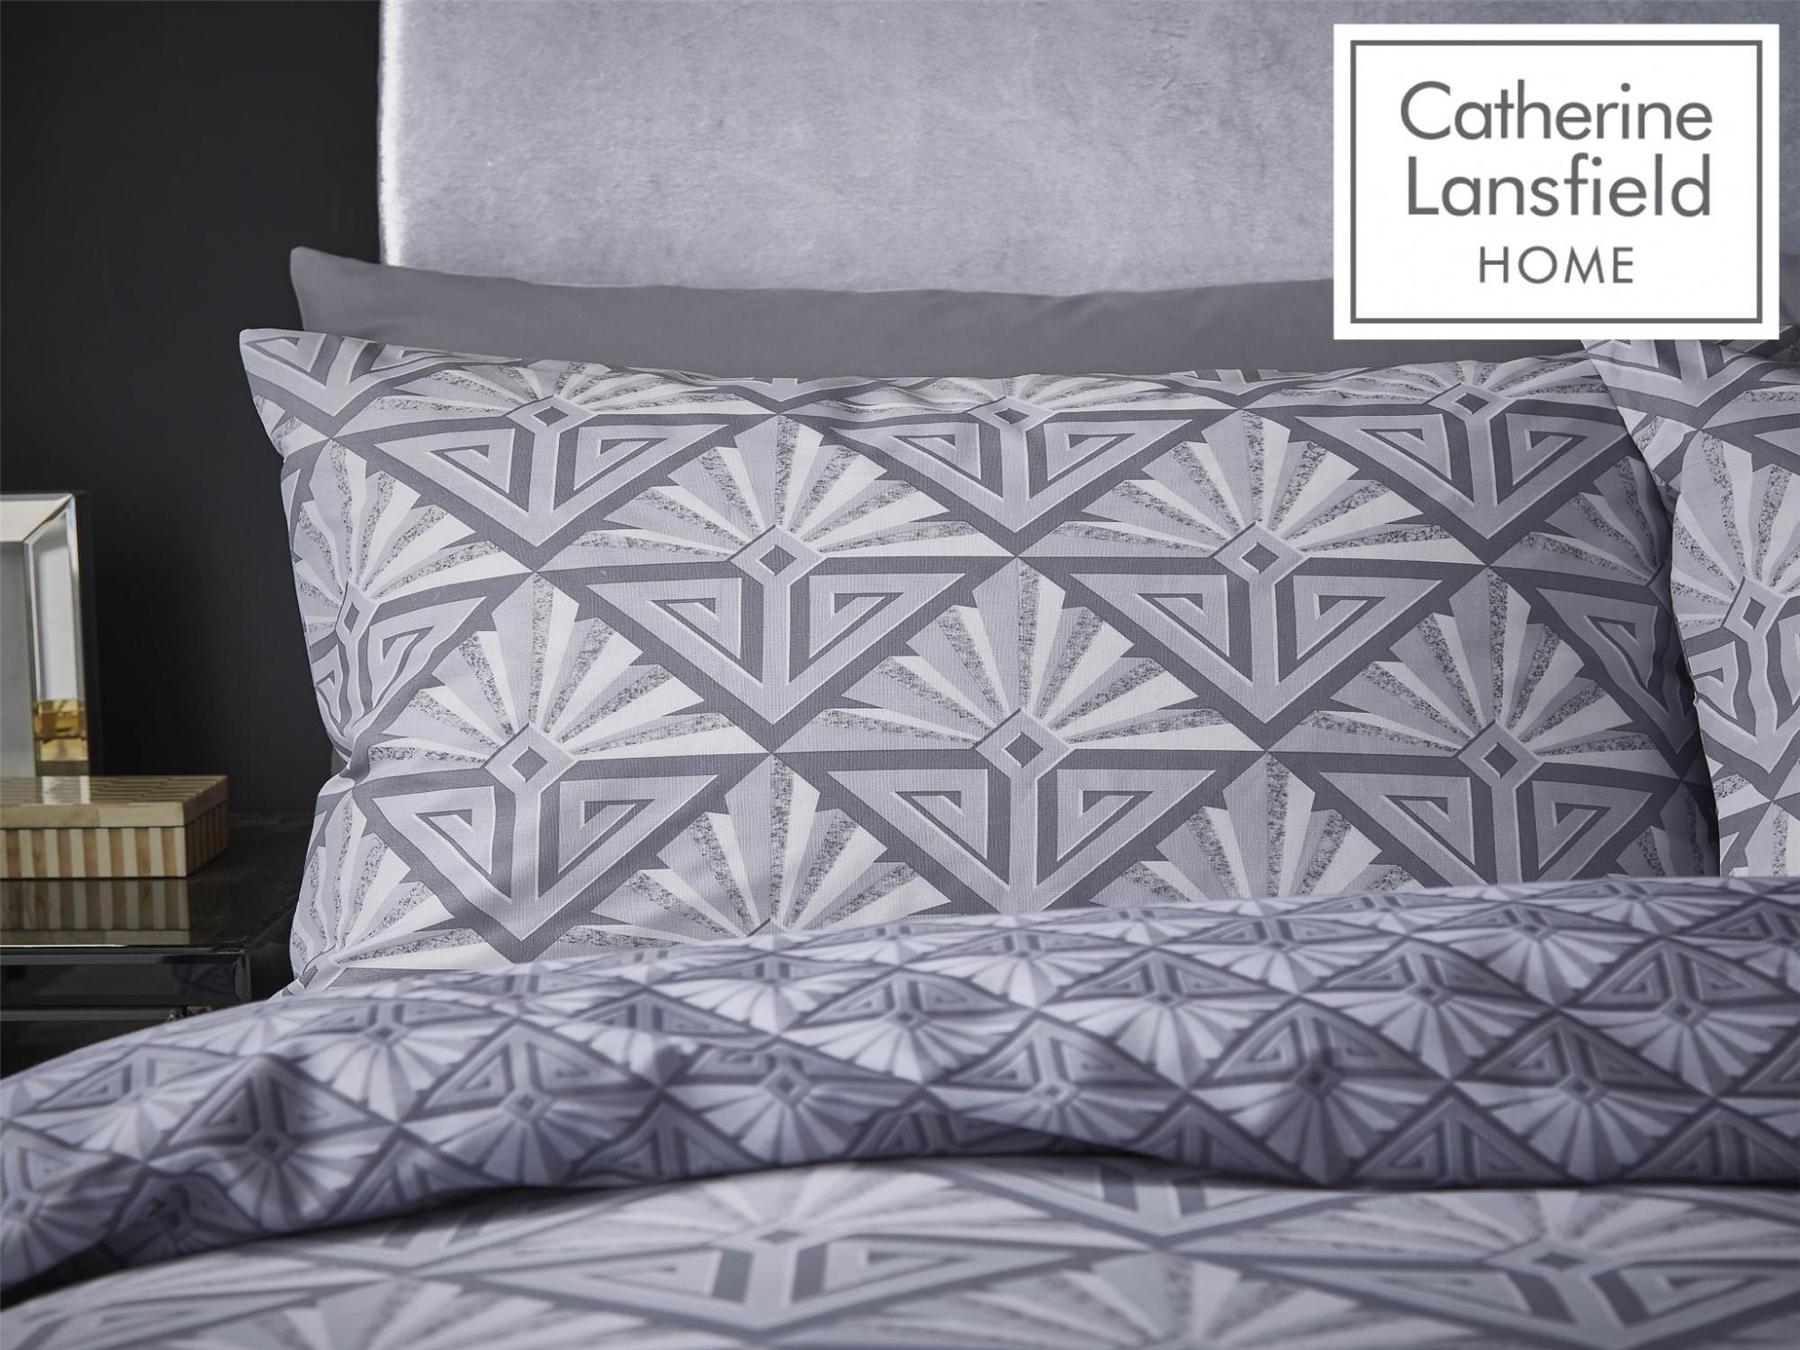 Catherine-Lansfield-Duvet-Set-Reversible-Art-Deco-Grey-Bedding-Pillows-Curtains thumbnail 12